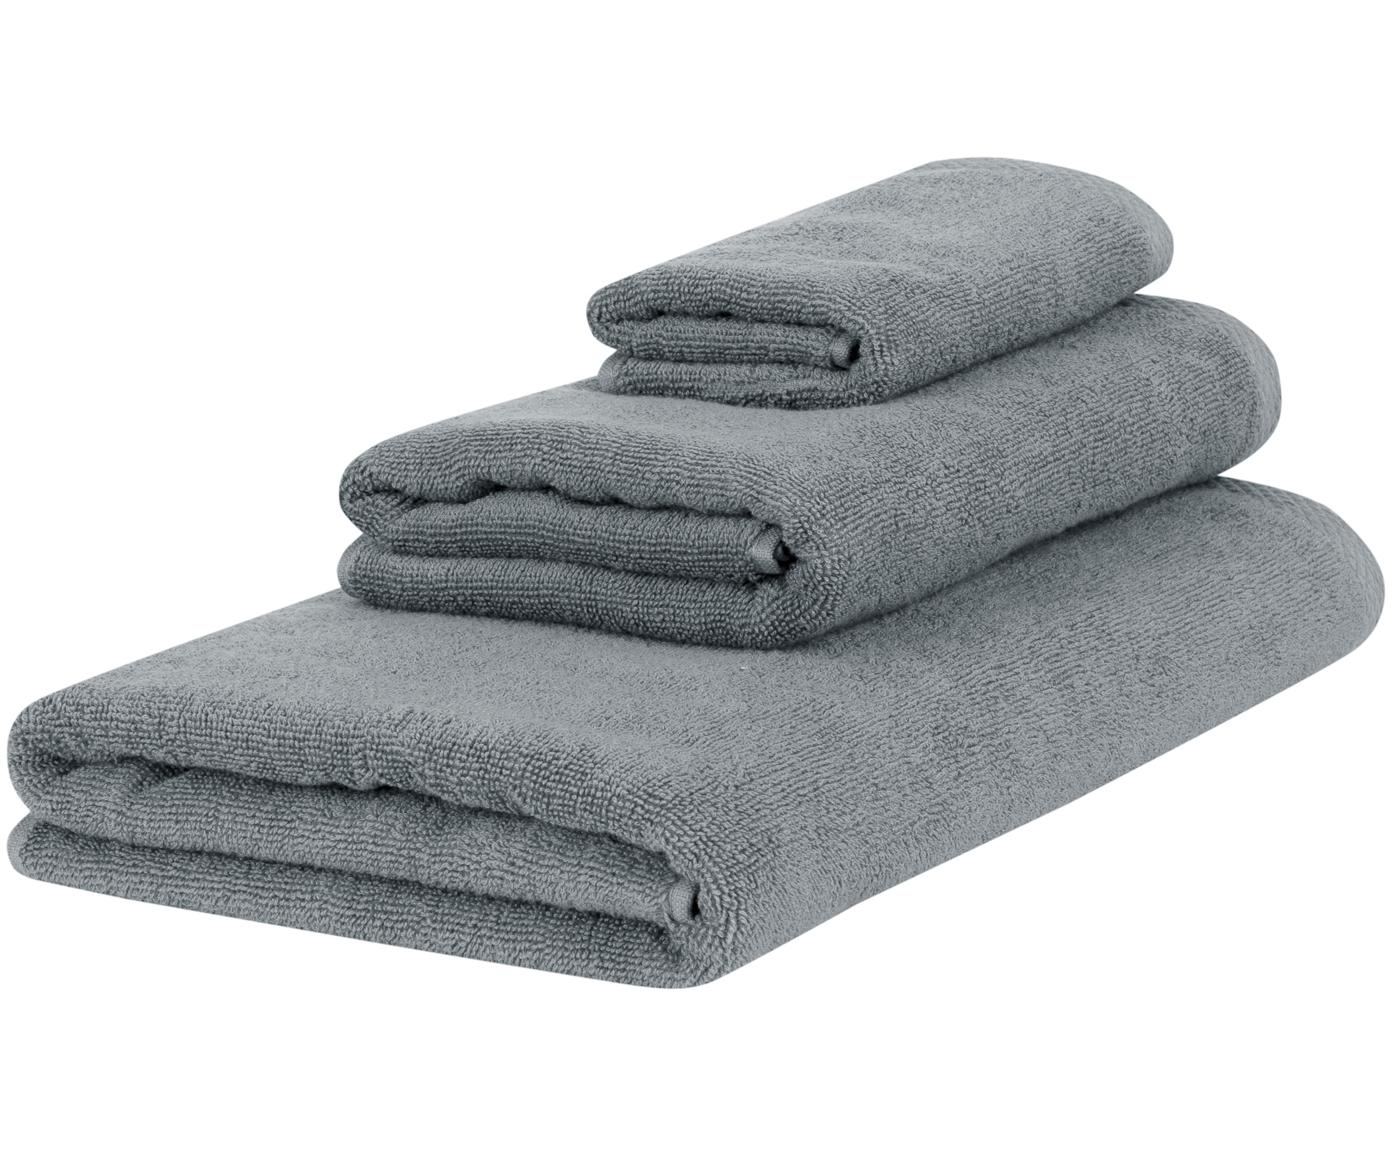 Set de toallas Comfort, 3pzas., Gris oscuro, tamaños diferentes